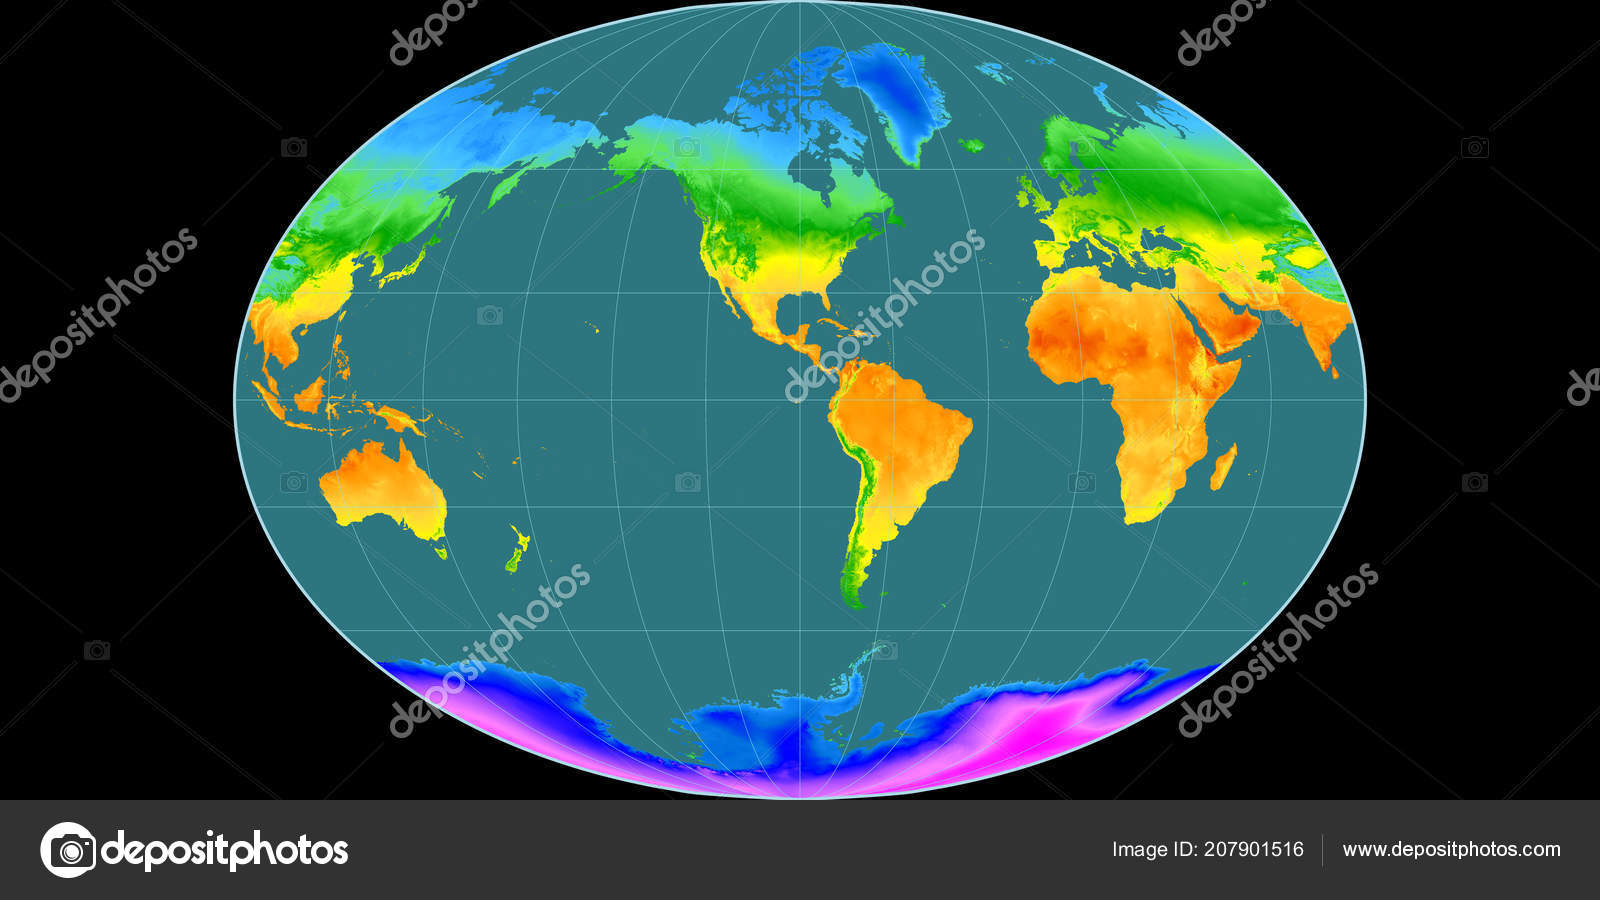 Mapa Sveta Fahey Projekce Zapadni Delky Prumerna Rocni Teplota